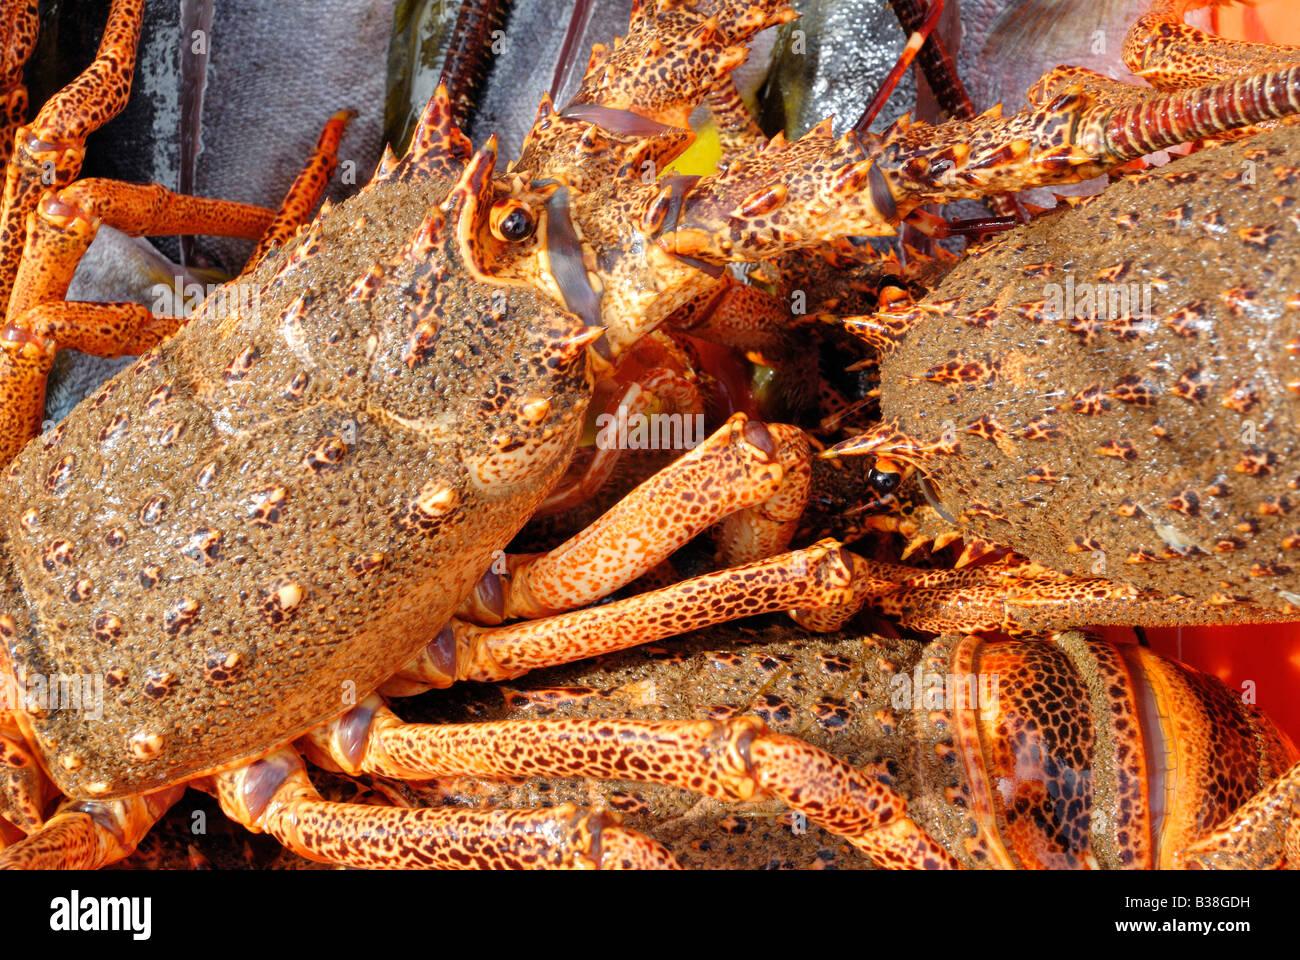 CHL Chile Juan Fernandez archipelago Robinson Crusoe Island 05 2007 Alive crayfish - Stock Image